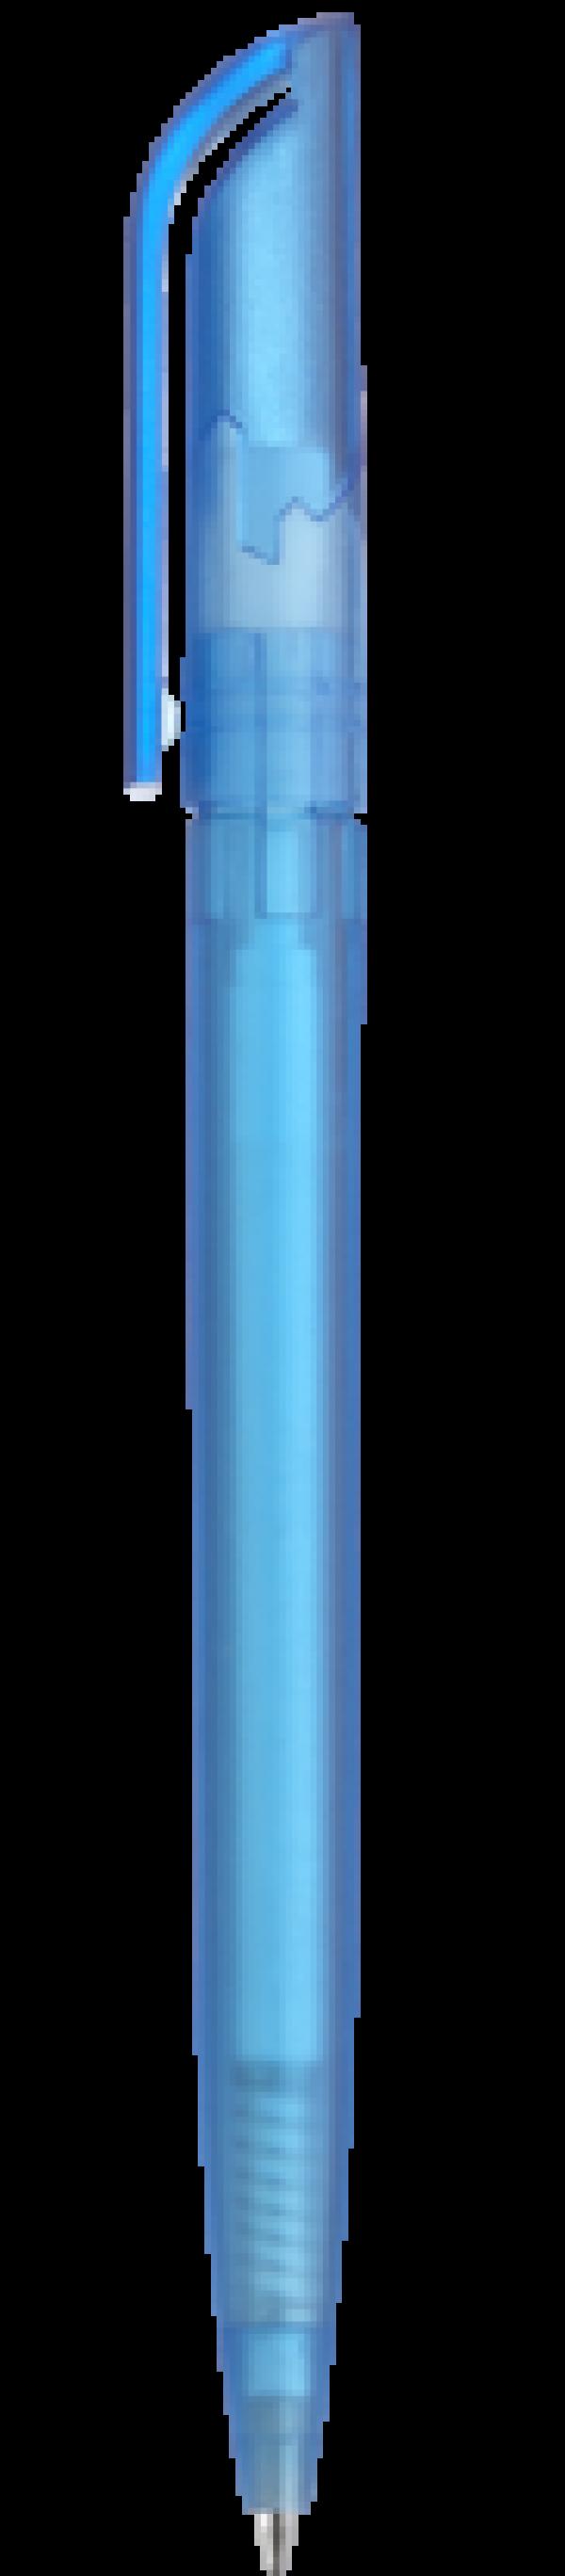 Шариковая ручка b 0-0040 TF TWISTY frozen